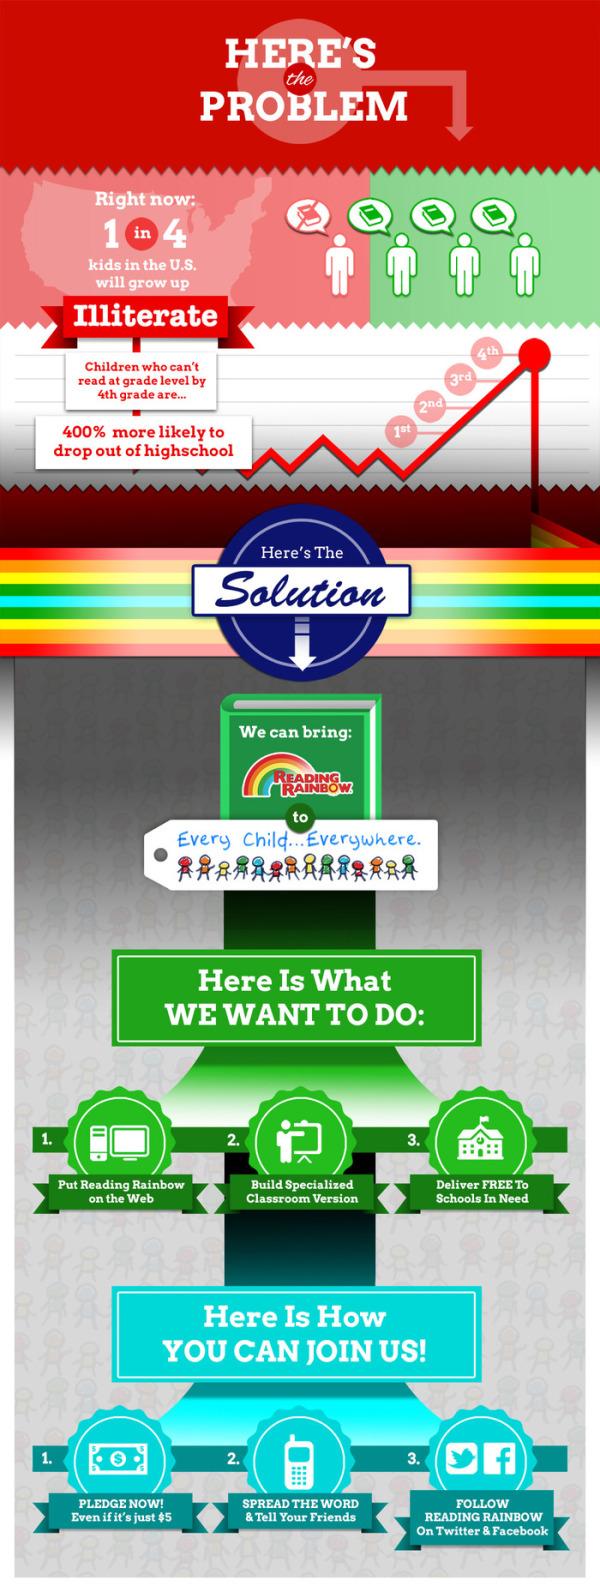 Reading Rainbow's Kickstarter Project infographic